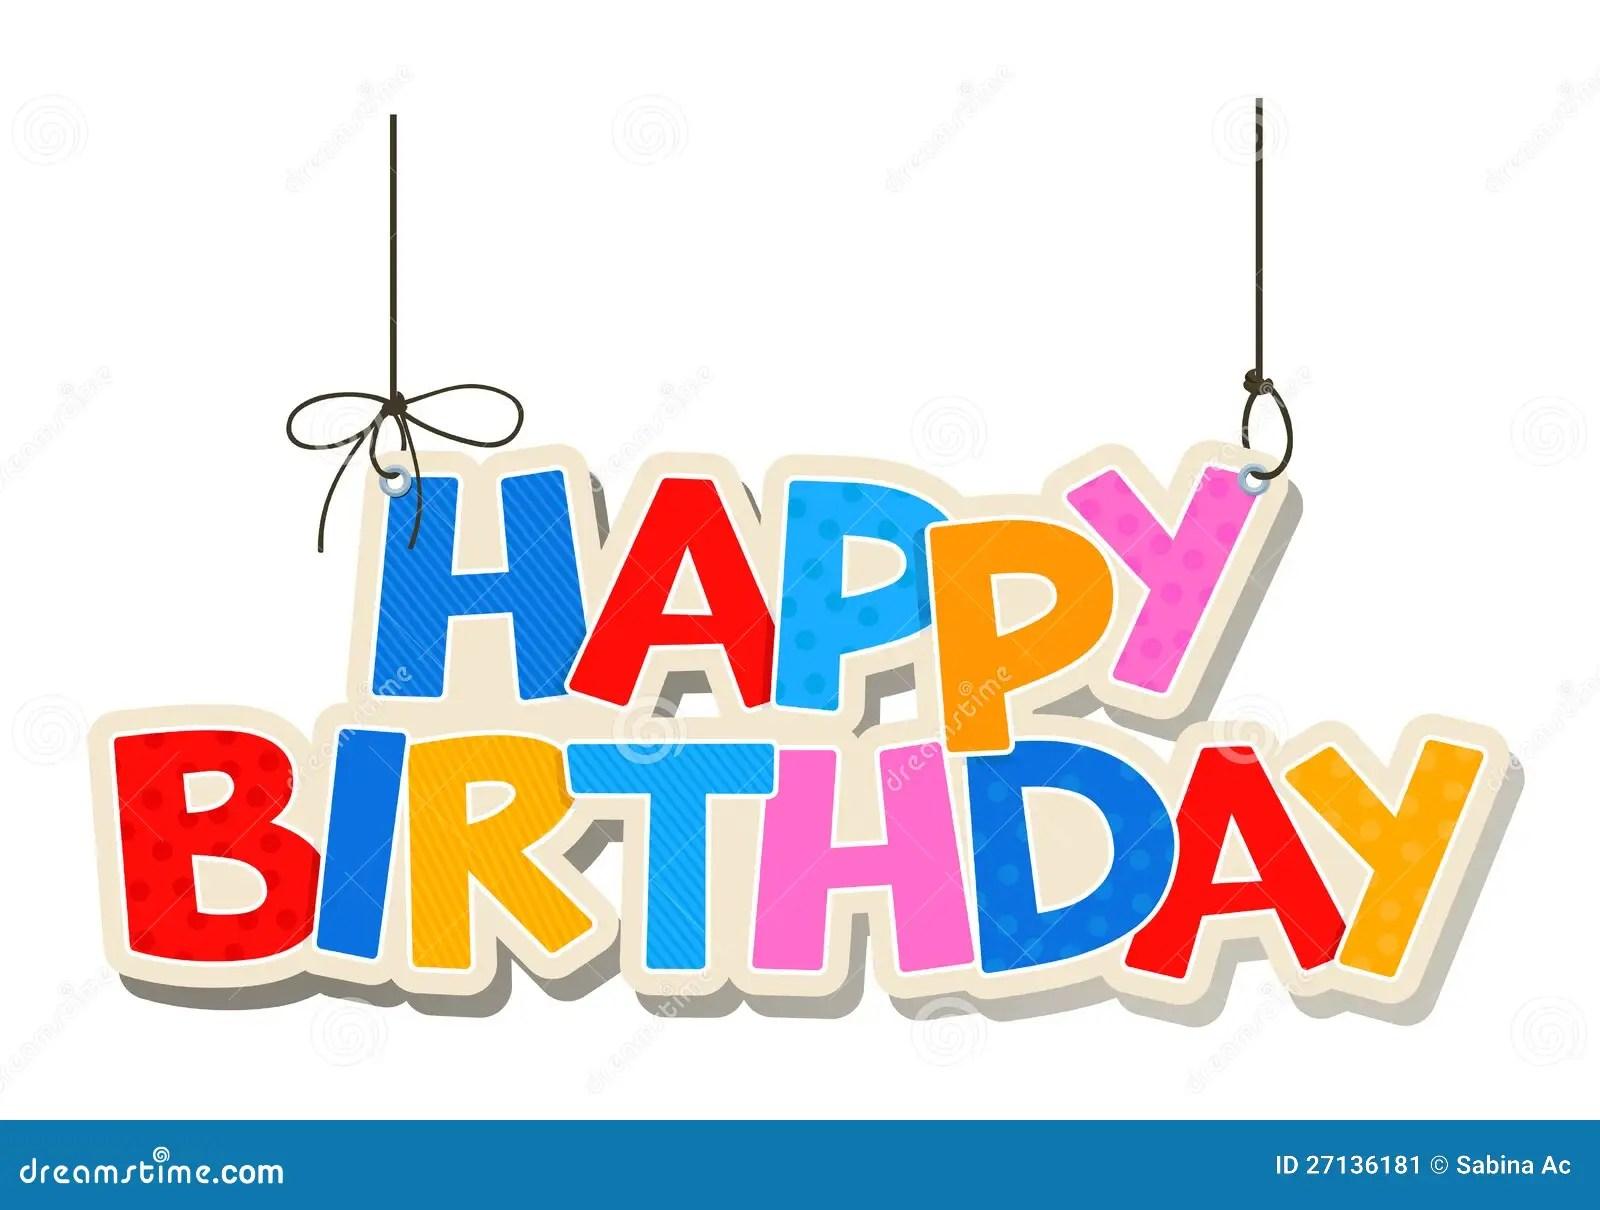 Happy Birthday Greetings Stock Vector Illustration Of Vector 27136181